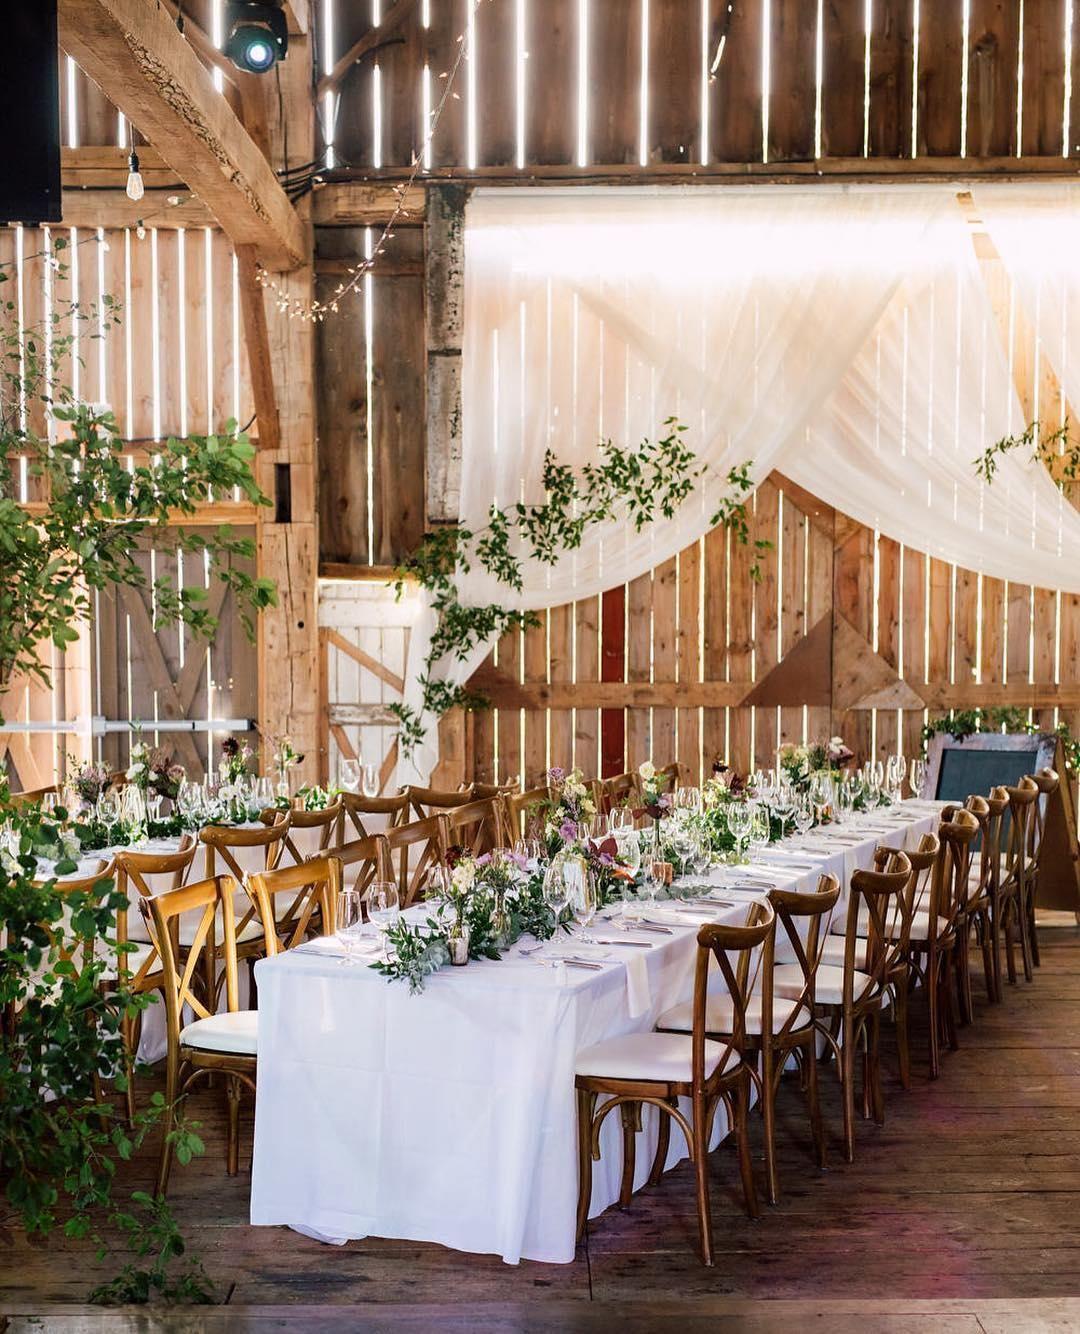 90 Beautiful Barn Venues Across the USA | Rustic wedding ...